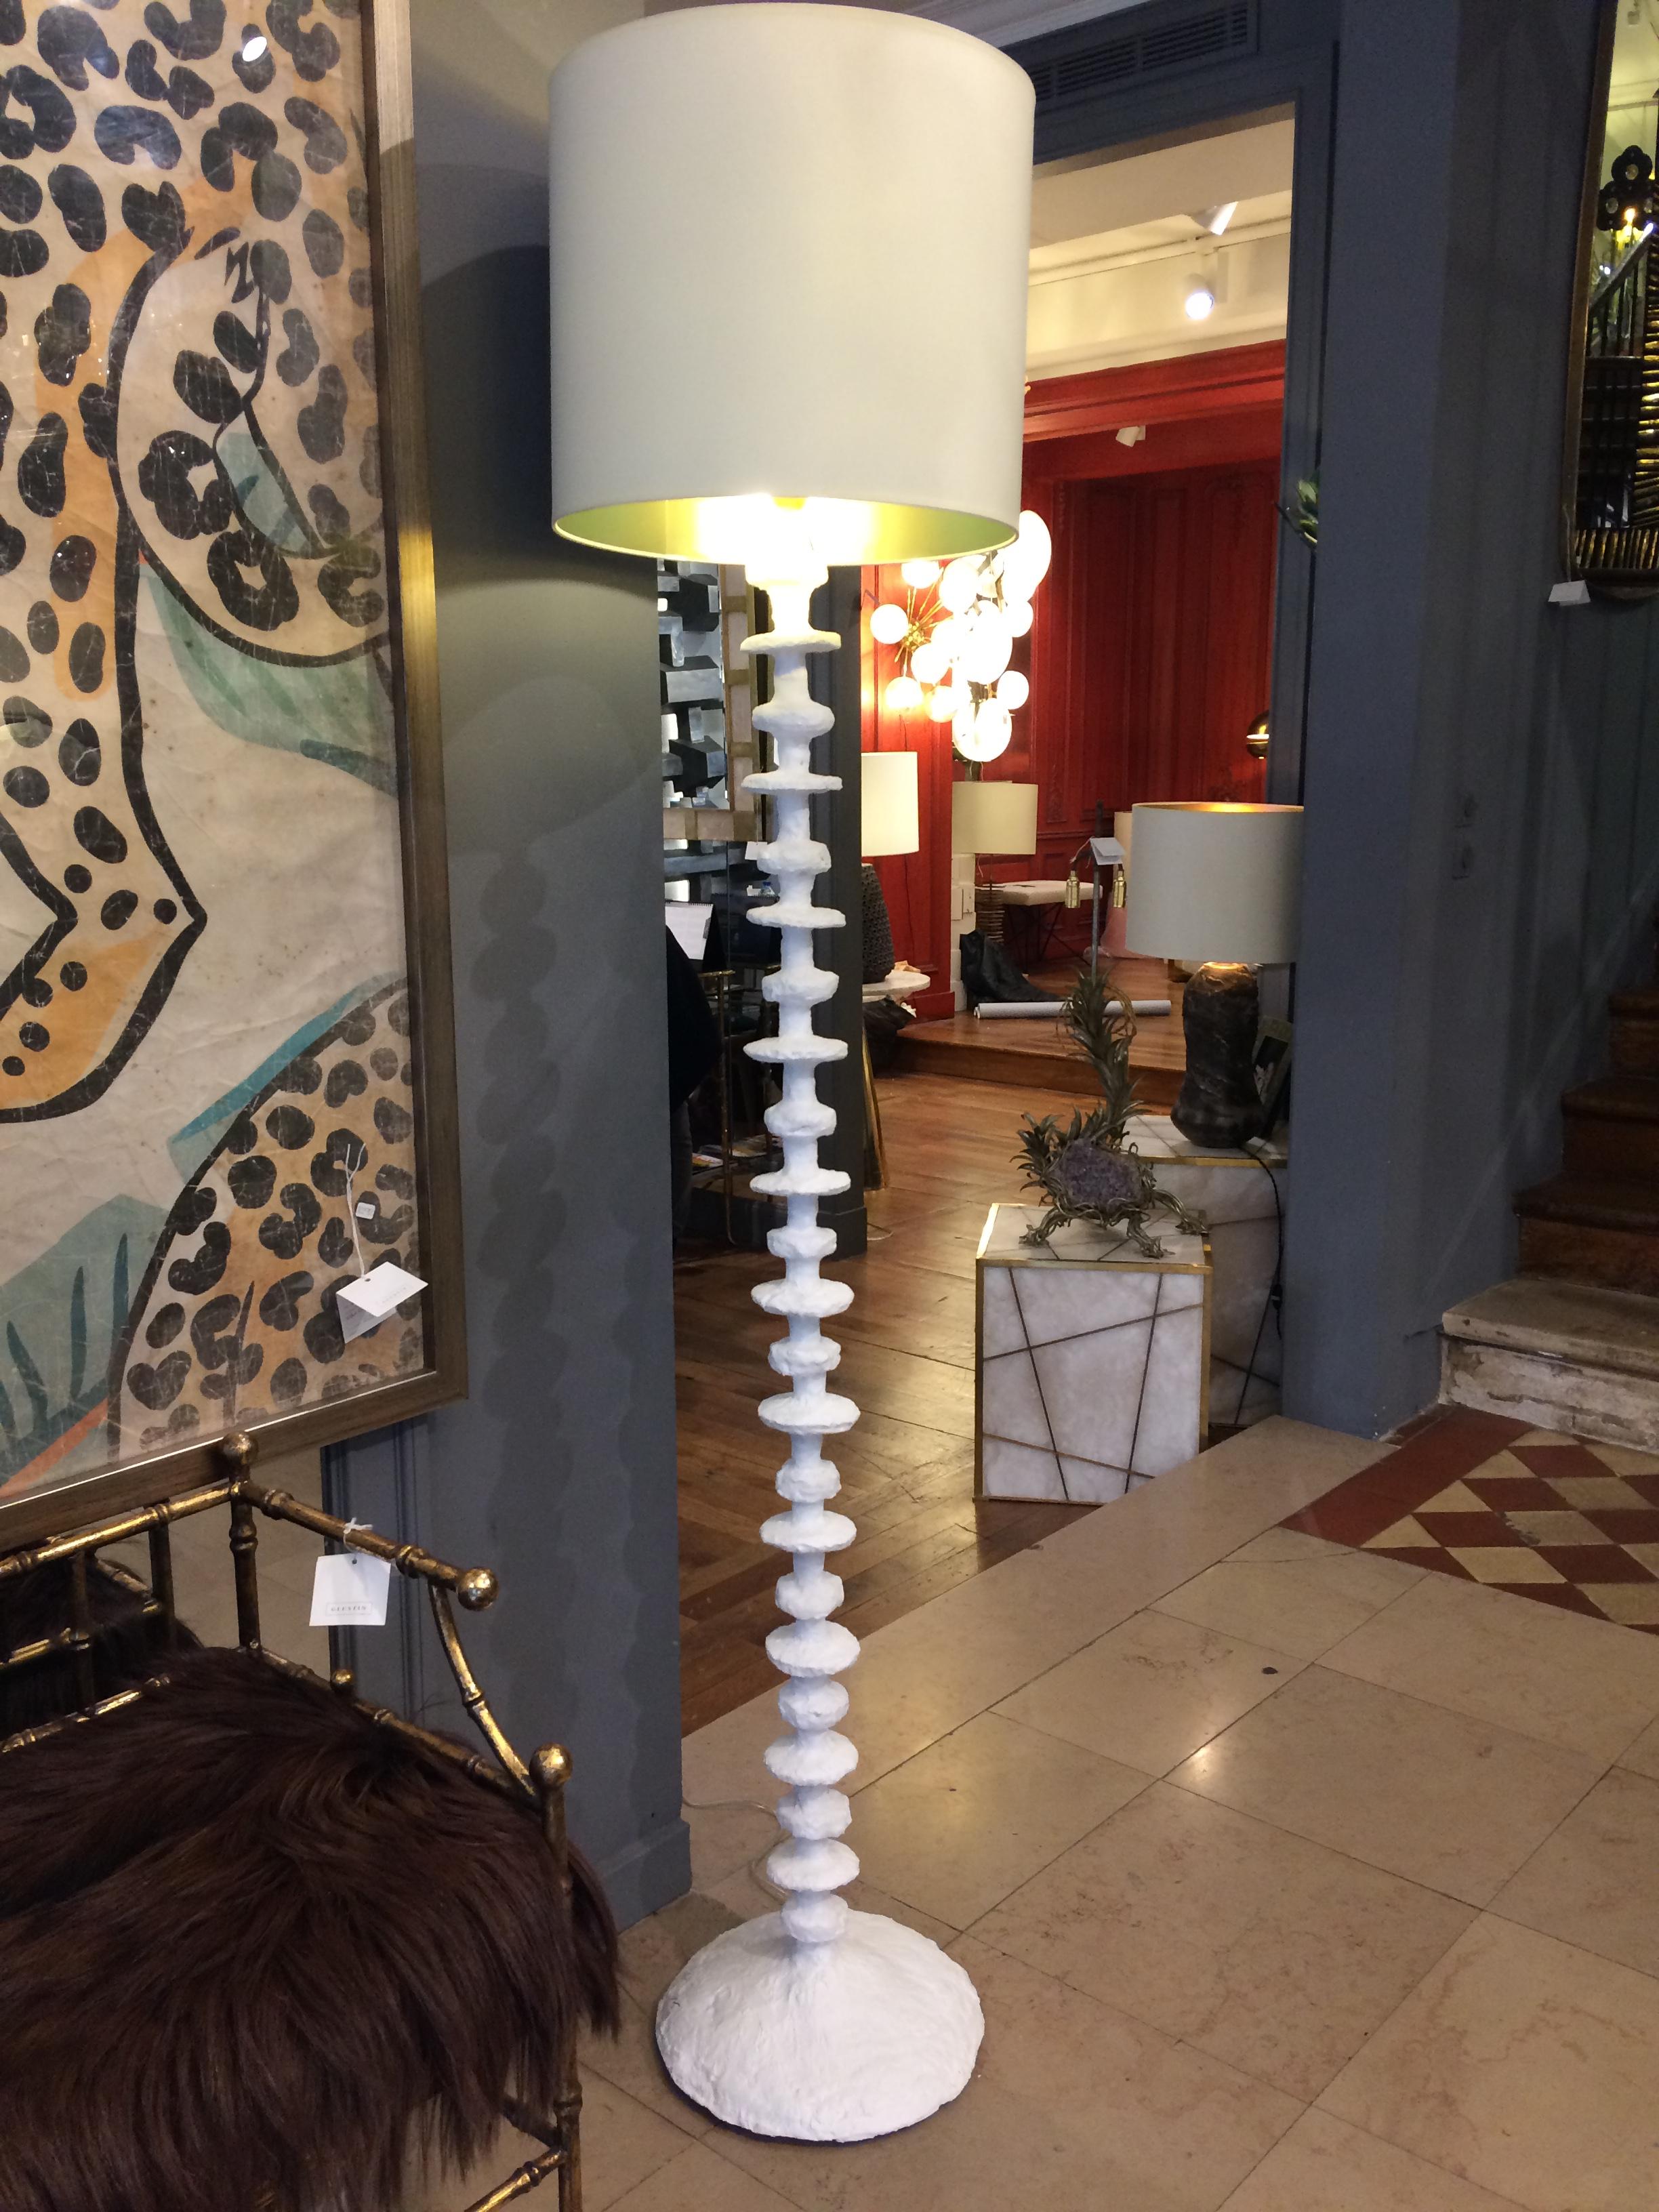 Cors lampadaire plaster_in situs